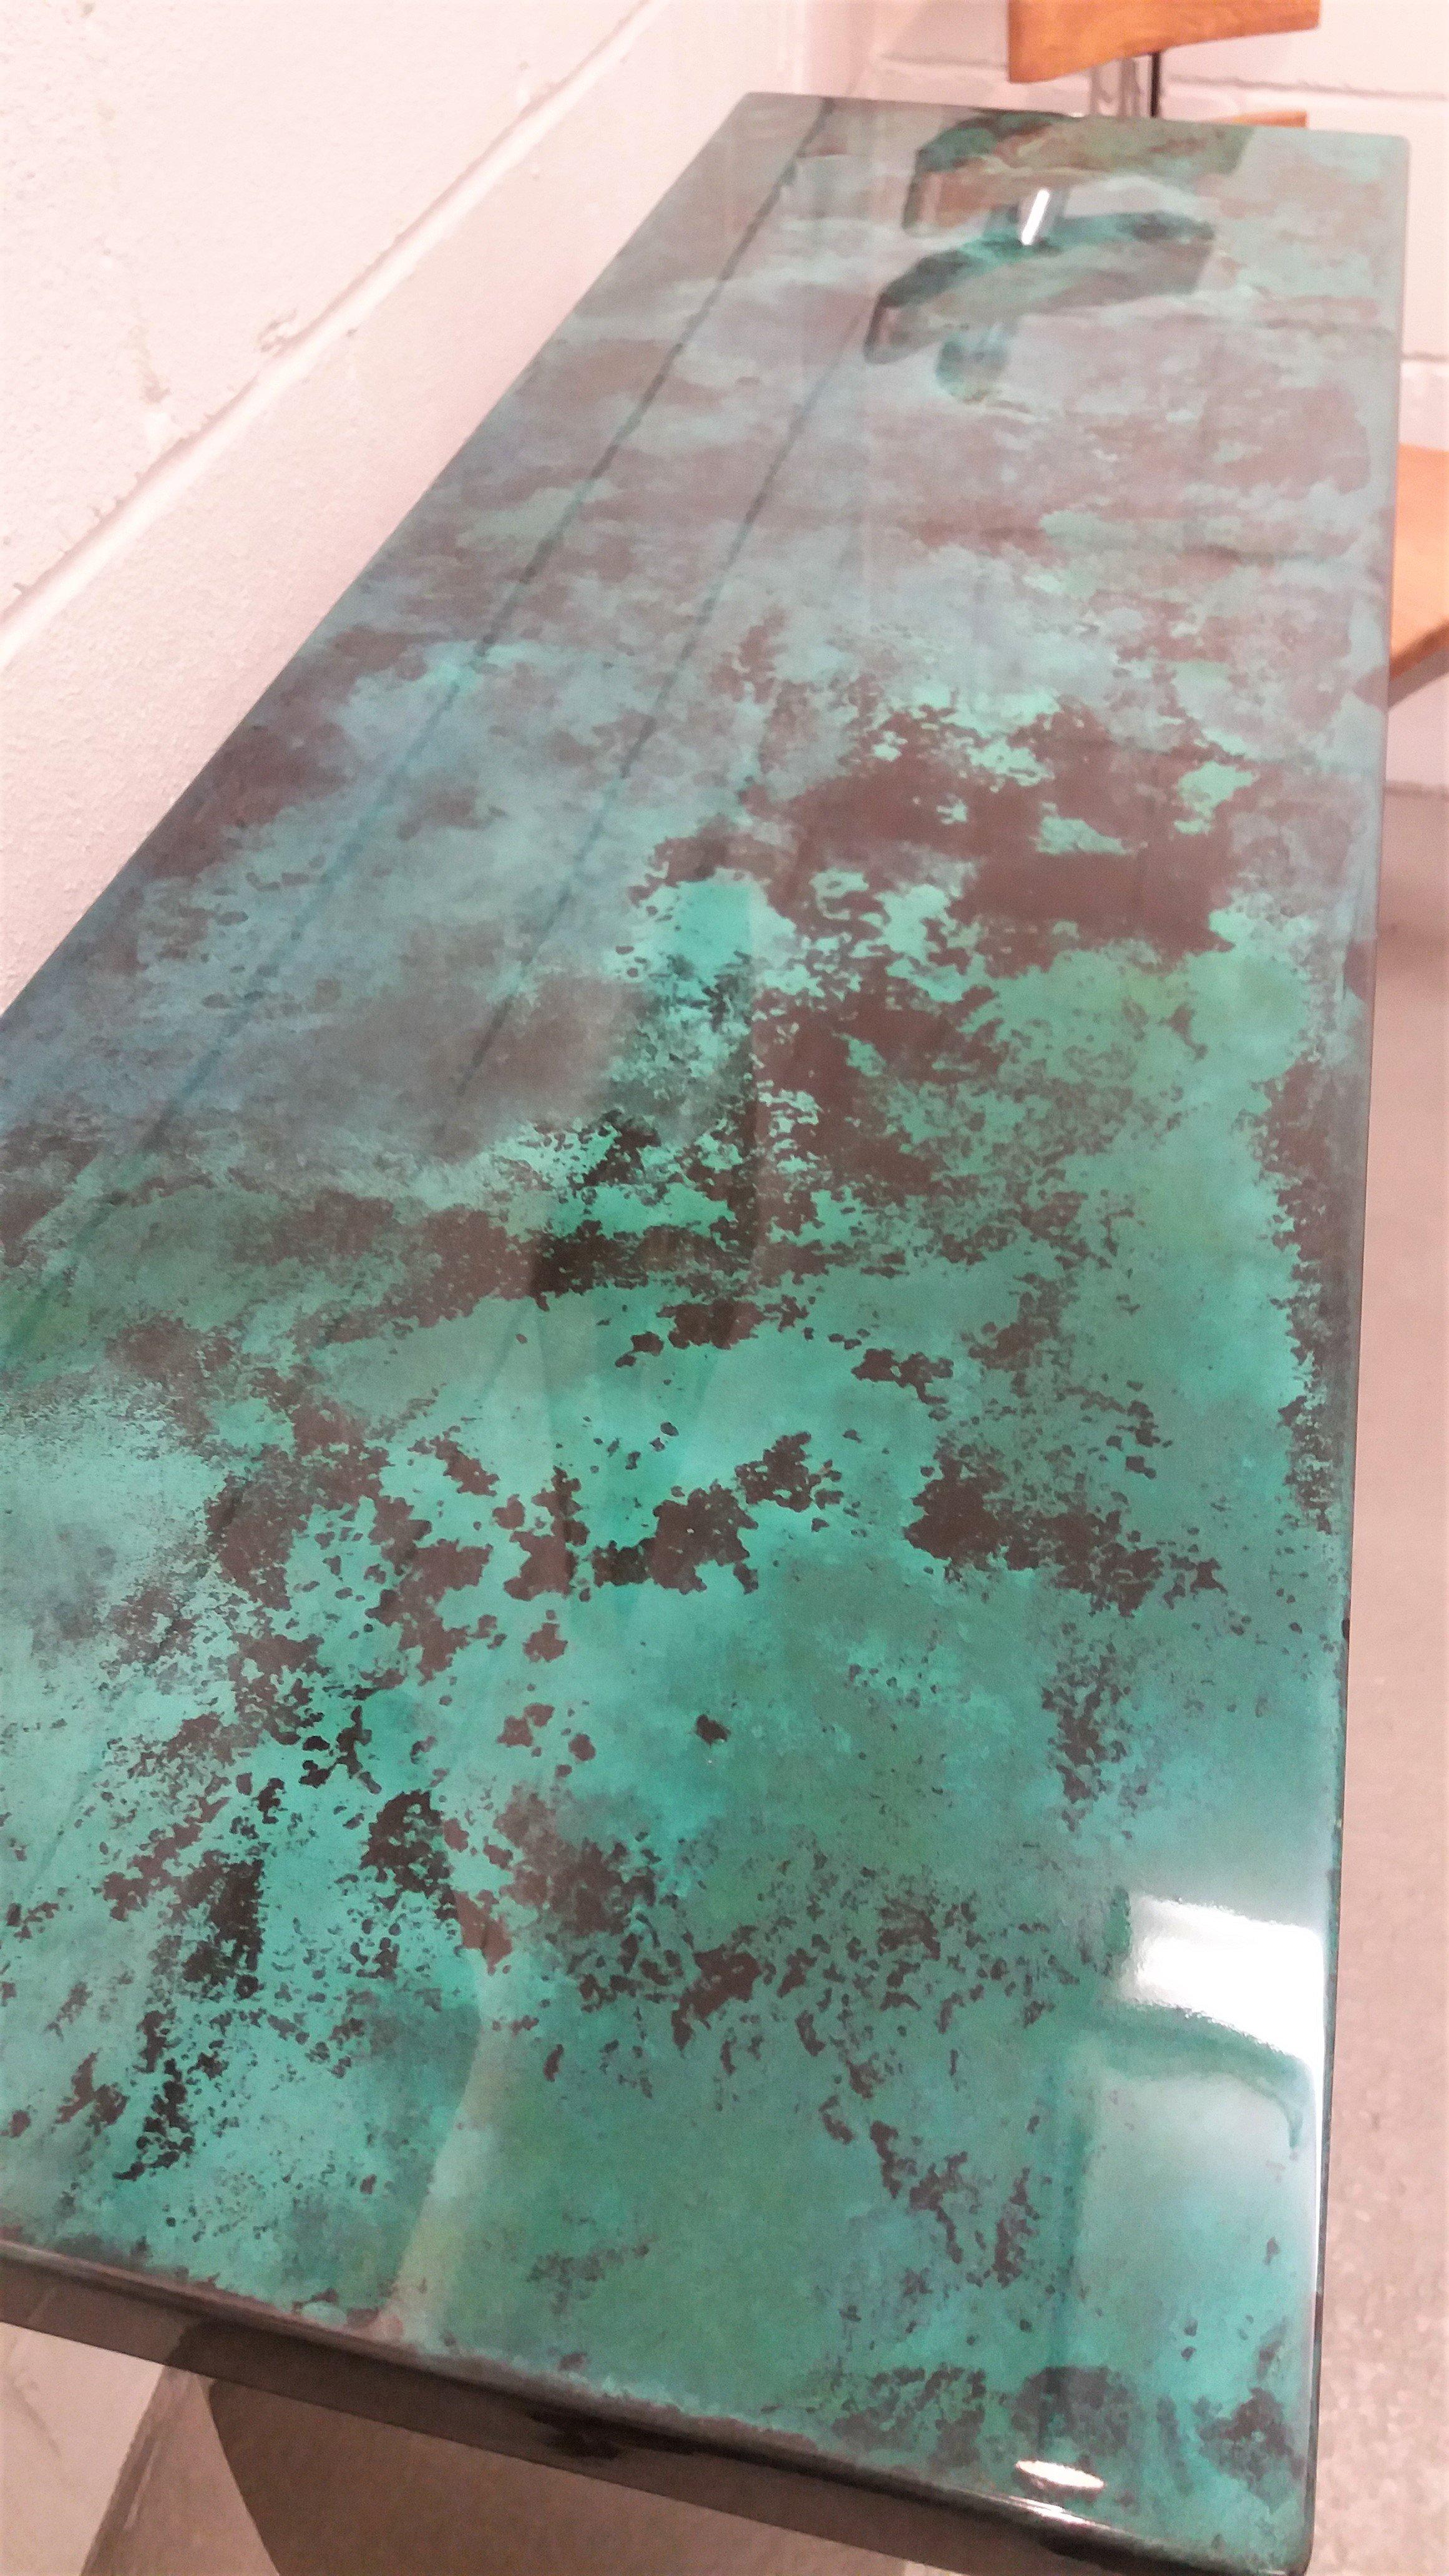 Custom paint finishes on furniture, bathroom panels. Artistic Metals, Uckfield.